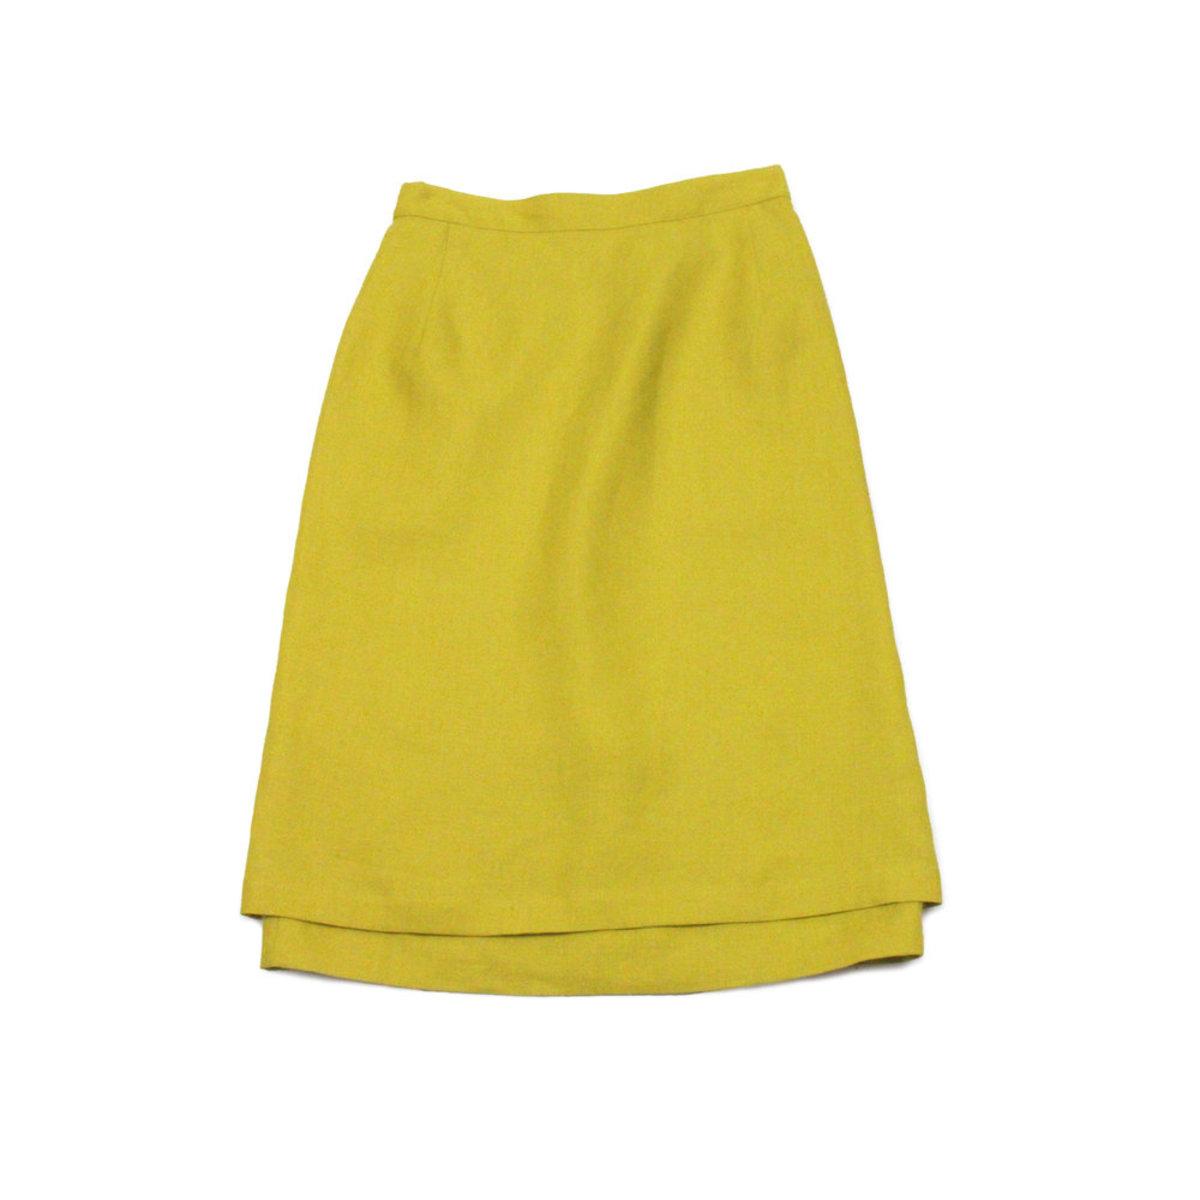 Apron Skirt 58